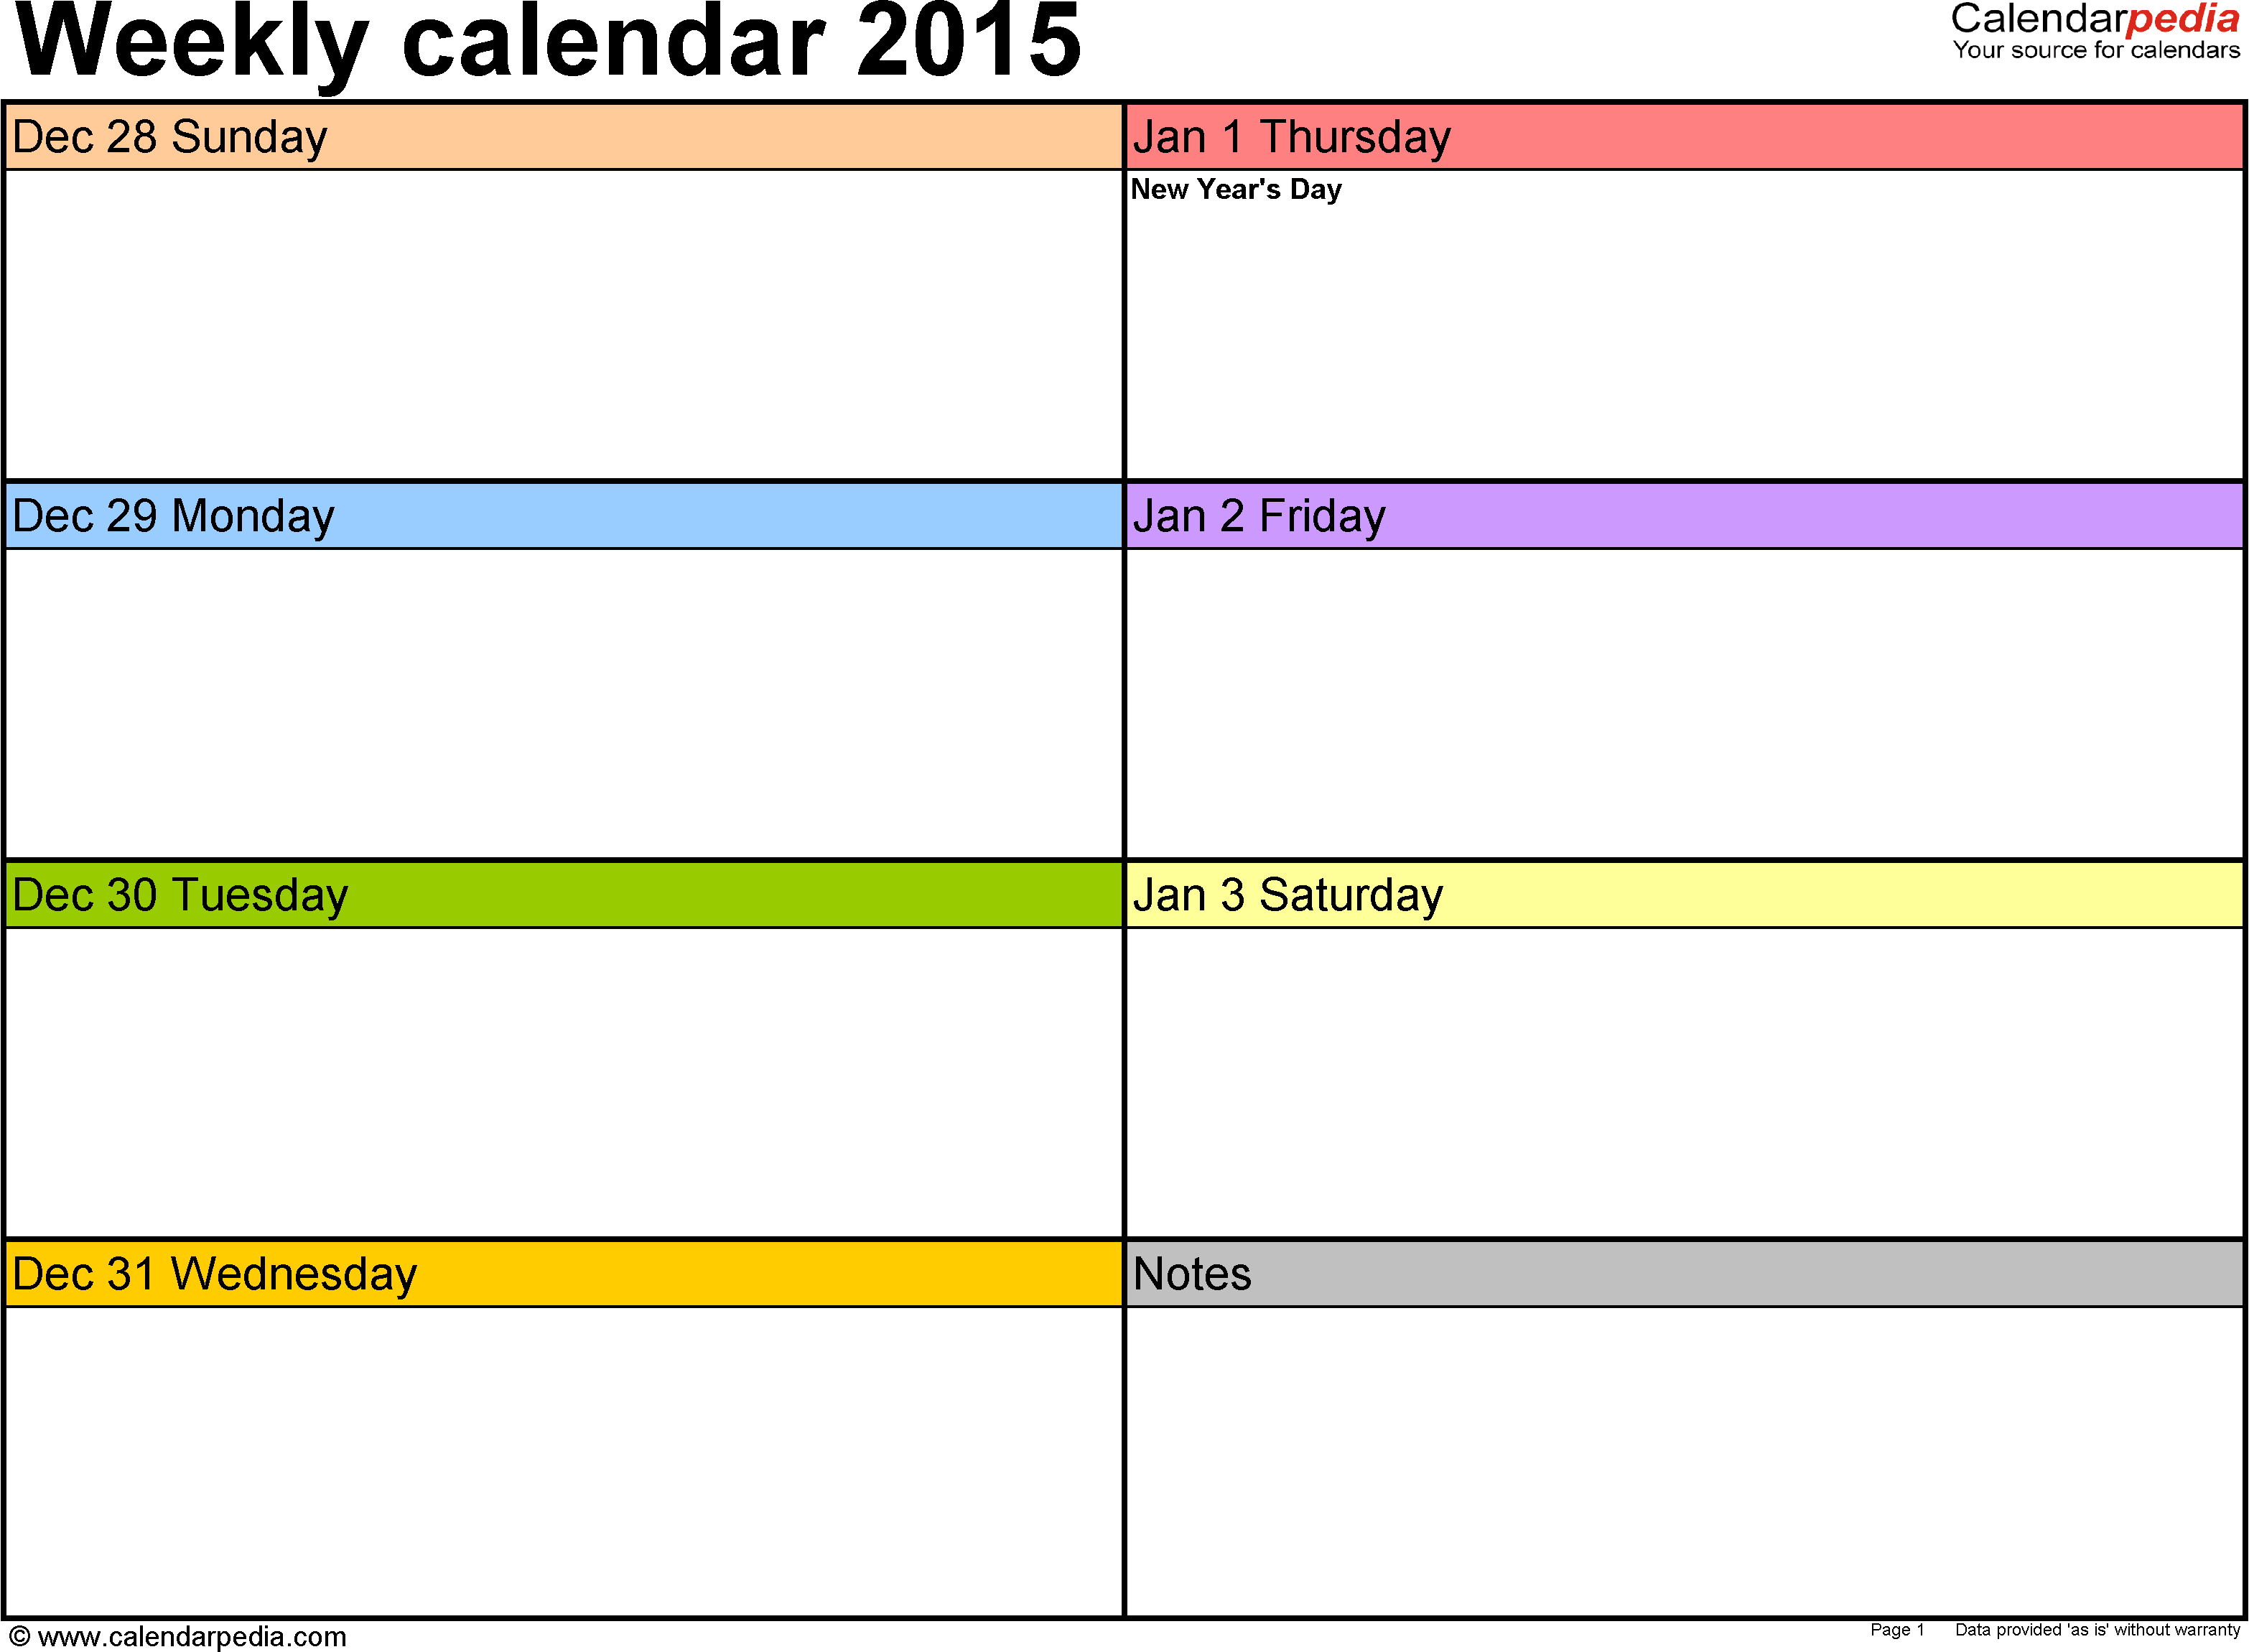 Weekly Calendar 2015 For Pdf - 12 Free Printable Templates regarding 7 Day Week Blank Calendar Printable